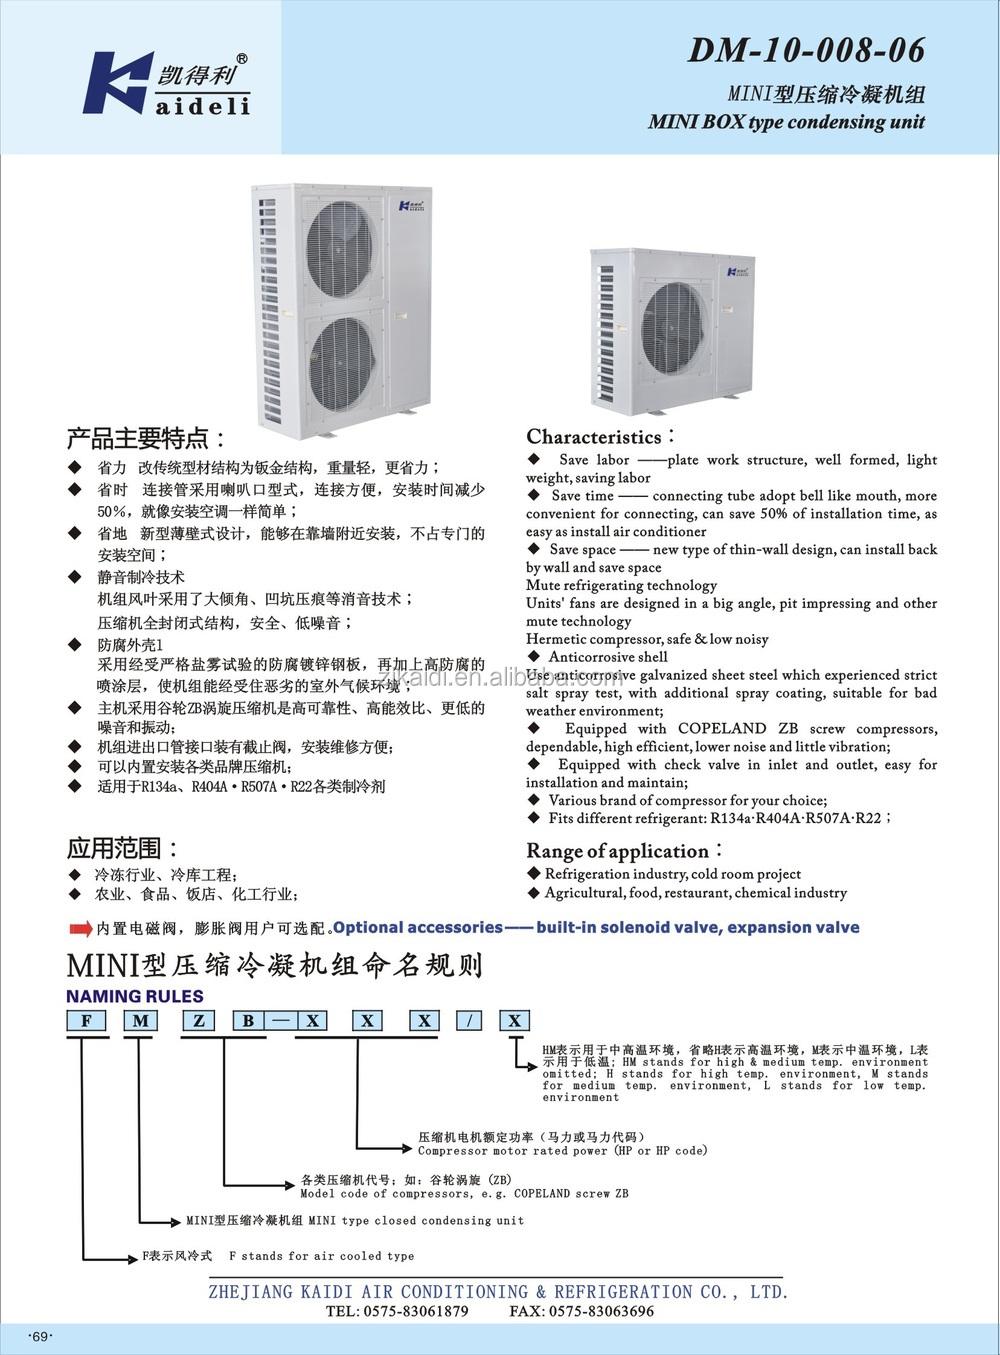 Box Type Copeland ZB-38 compressor condensing Unit for cold room